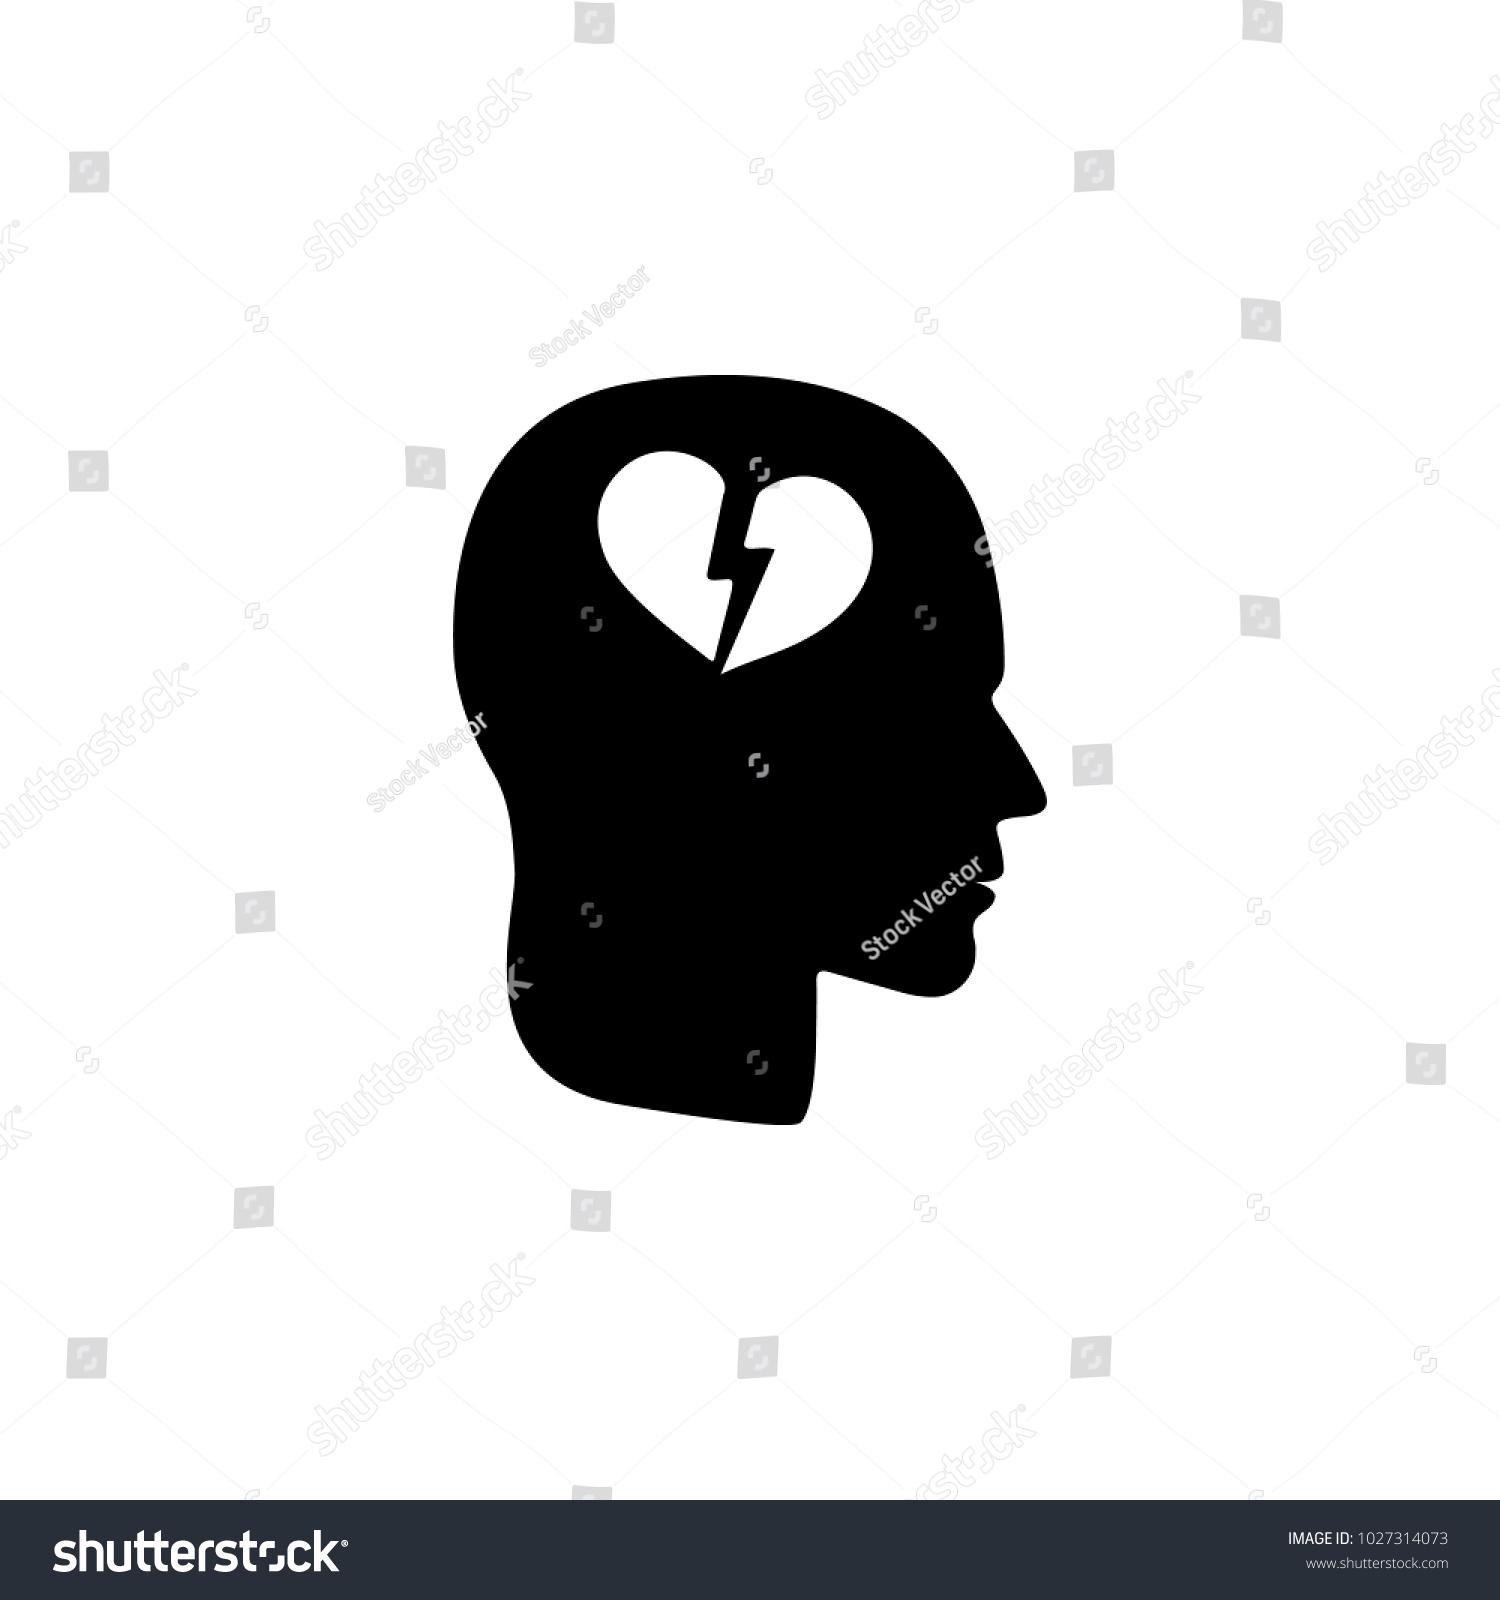 Broken heart head icon illustration psychological stock a broken heart in the head icon illustration of psychological disorder of people icon biocorpaavc Images